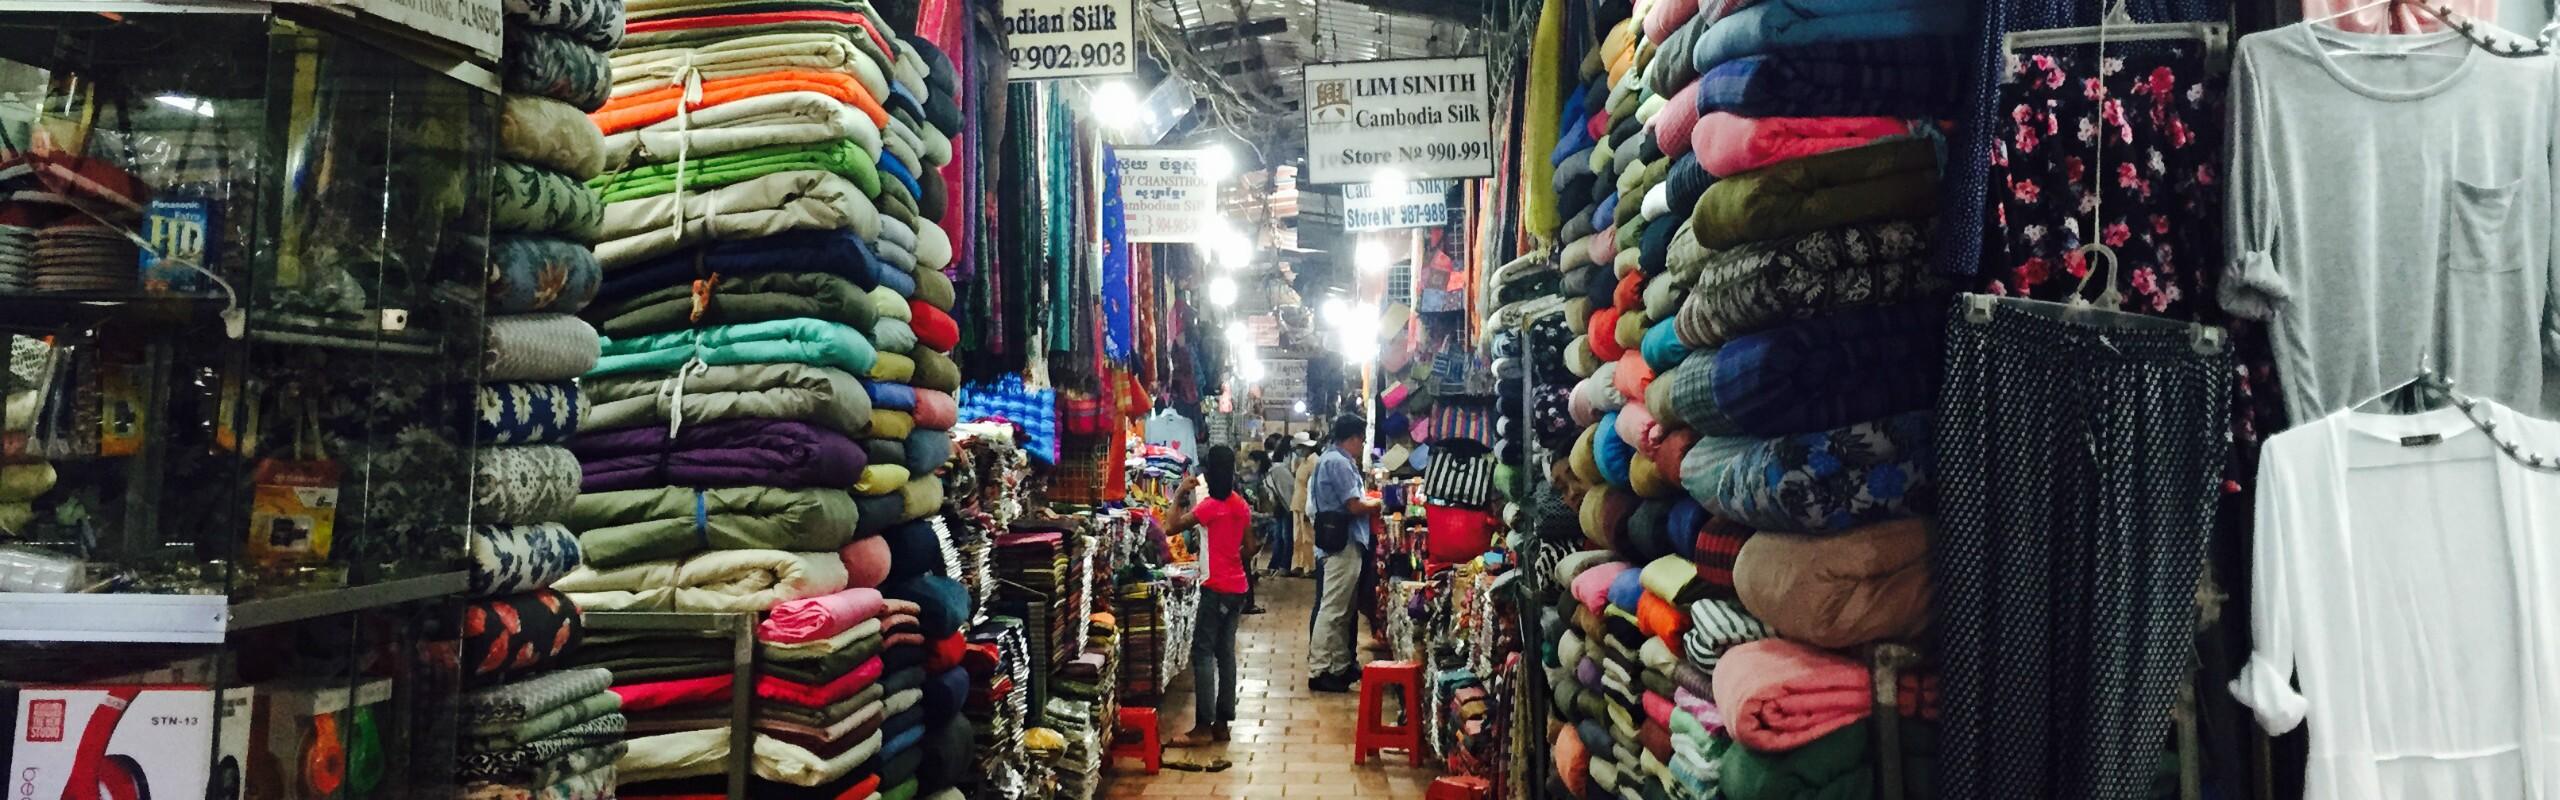 Shopping in Phnom Penh